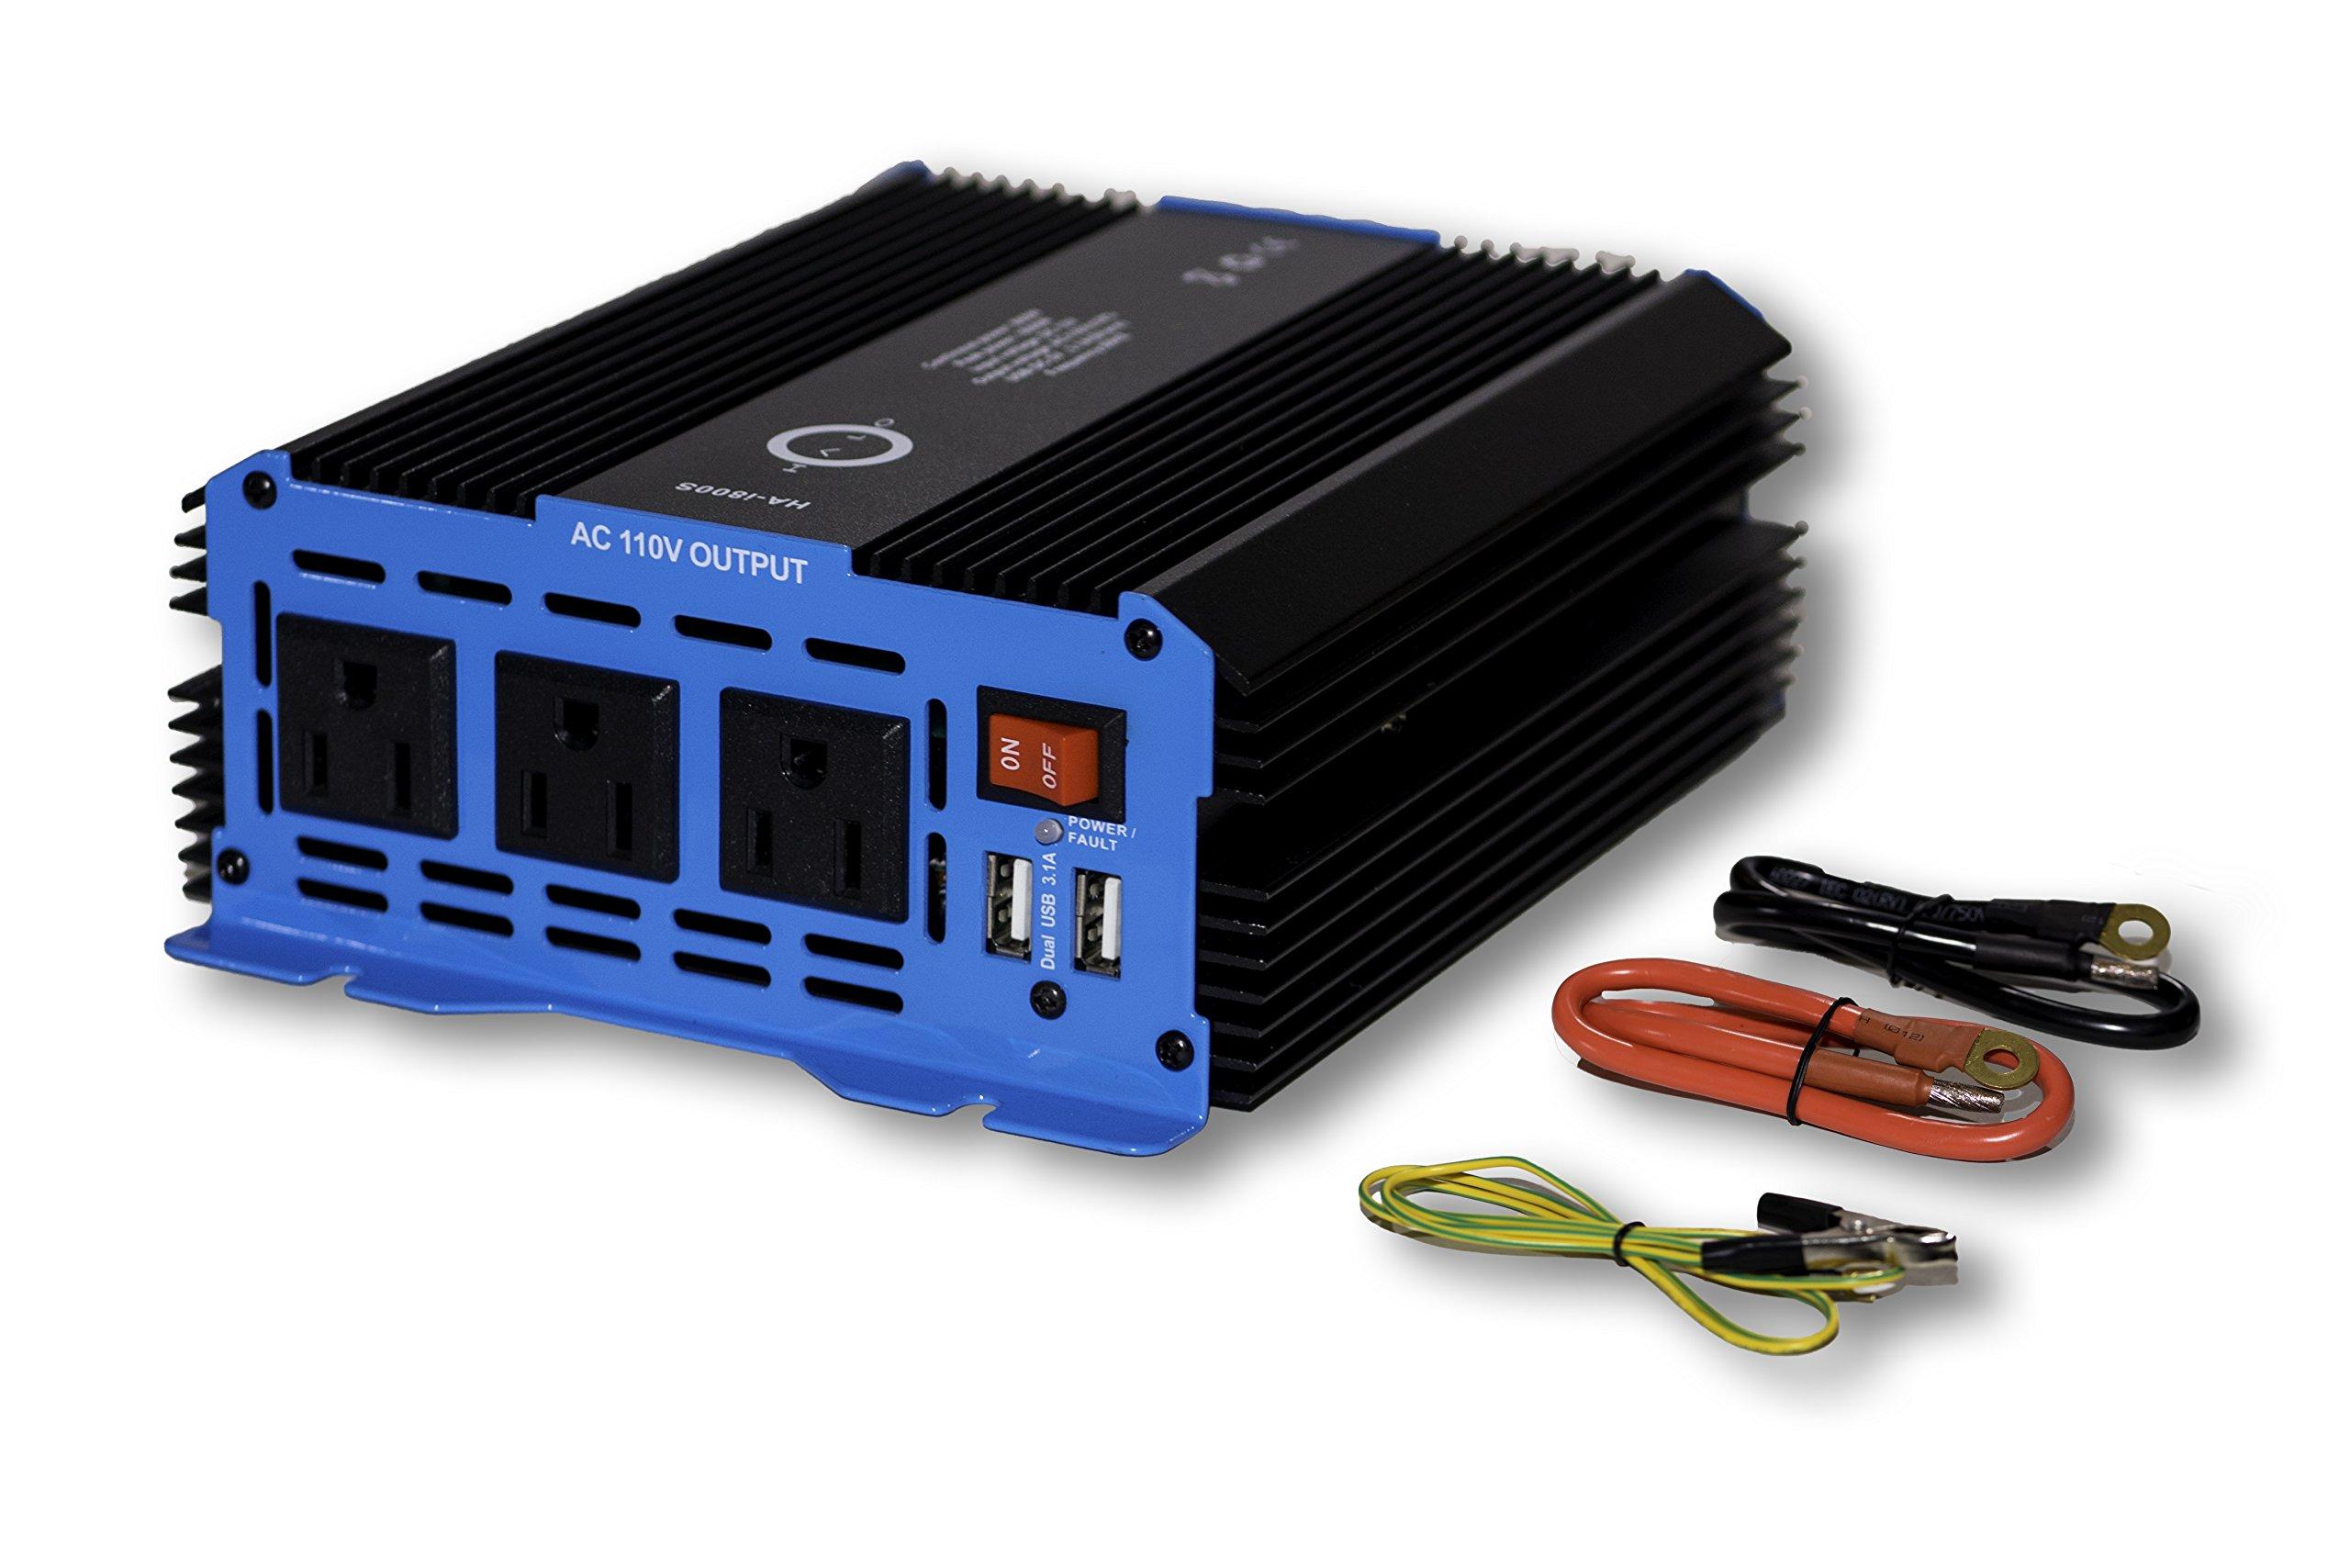 Halo Automotive 800 Watt Power Inverter 12V DC to 110V AC 3 Outlets and 2 USB Ports